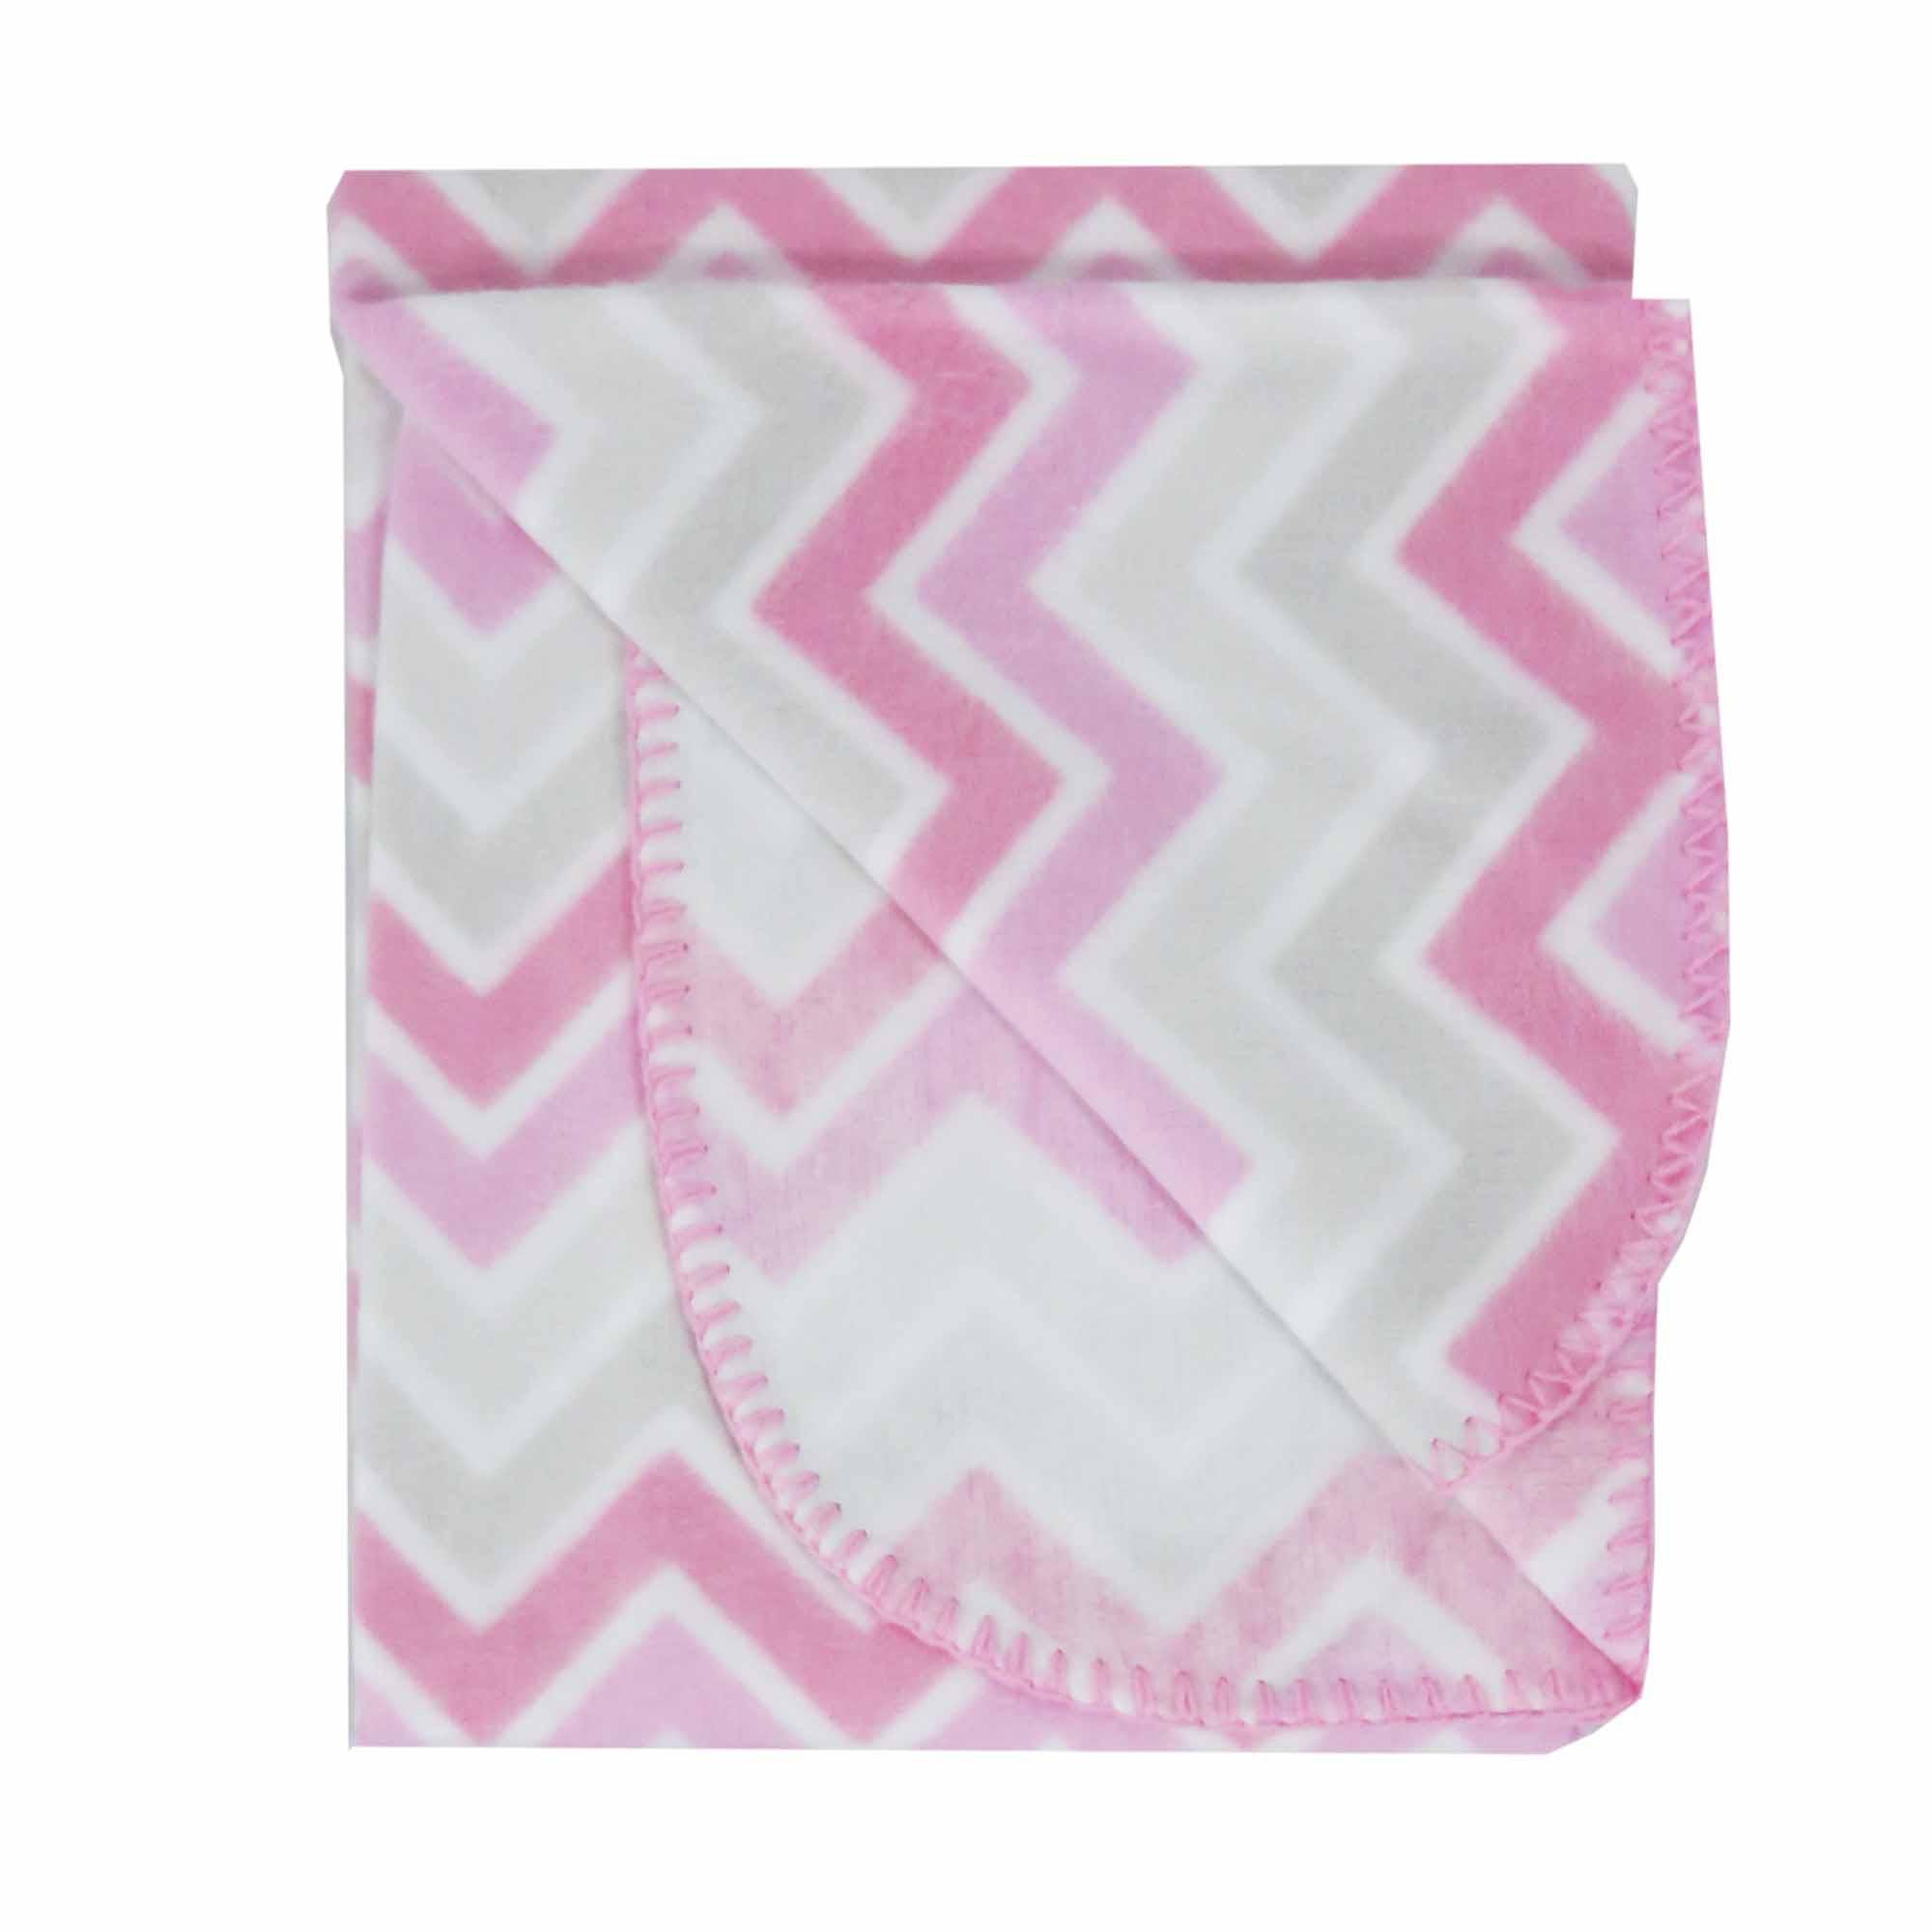 Cobertor Estampado 70x90 - Minasrey - Loupiot Classic